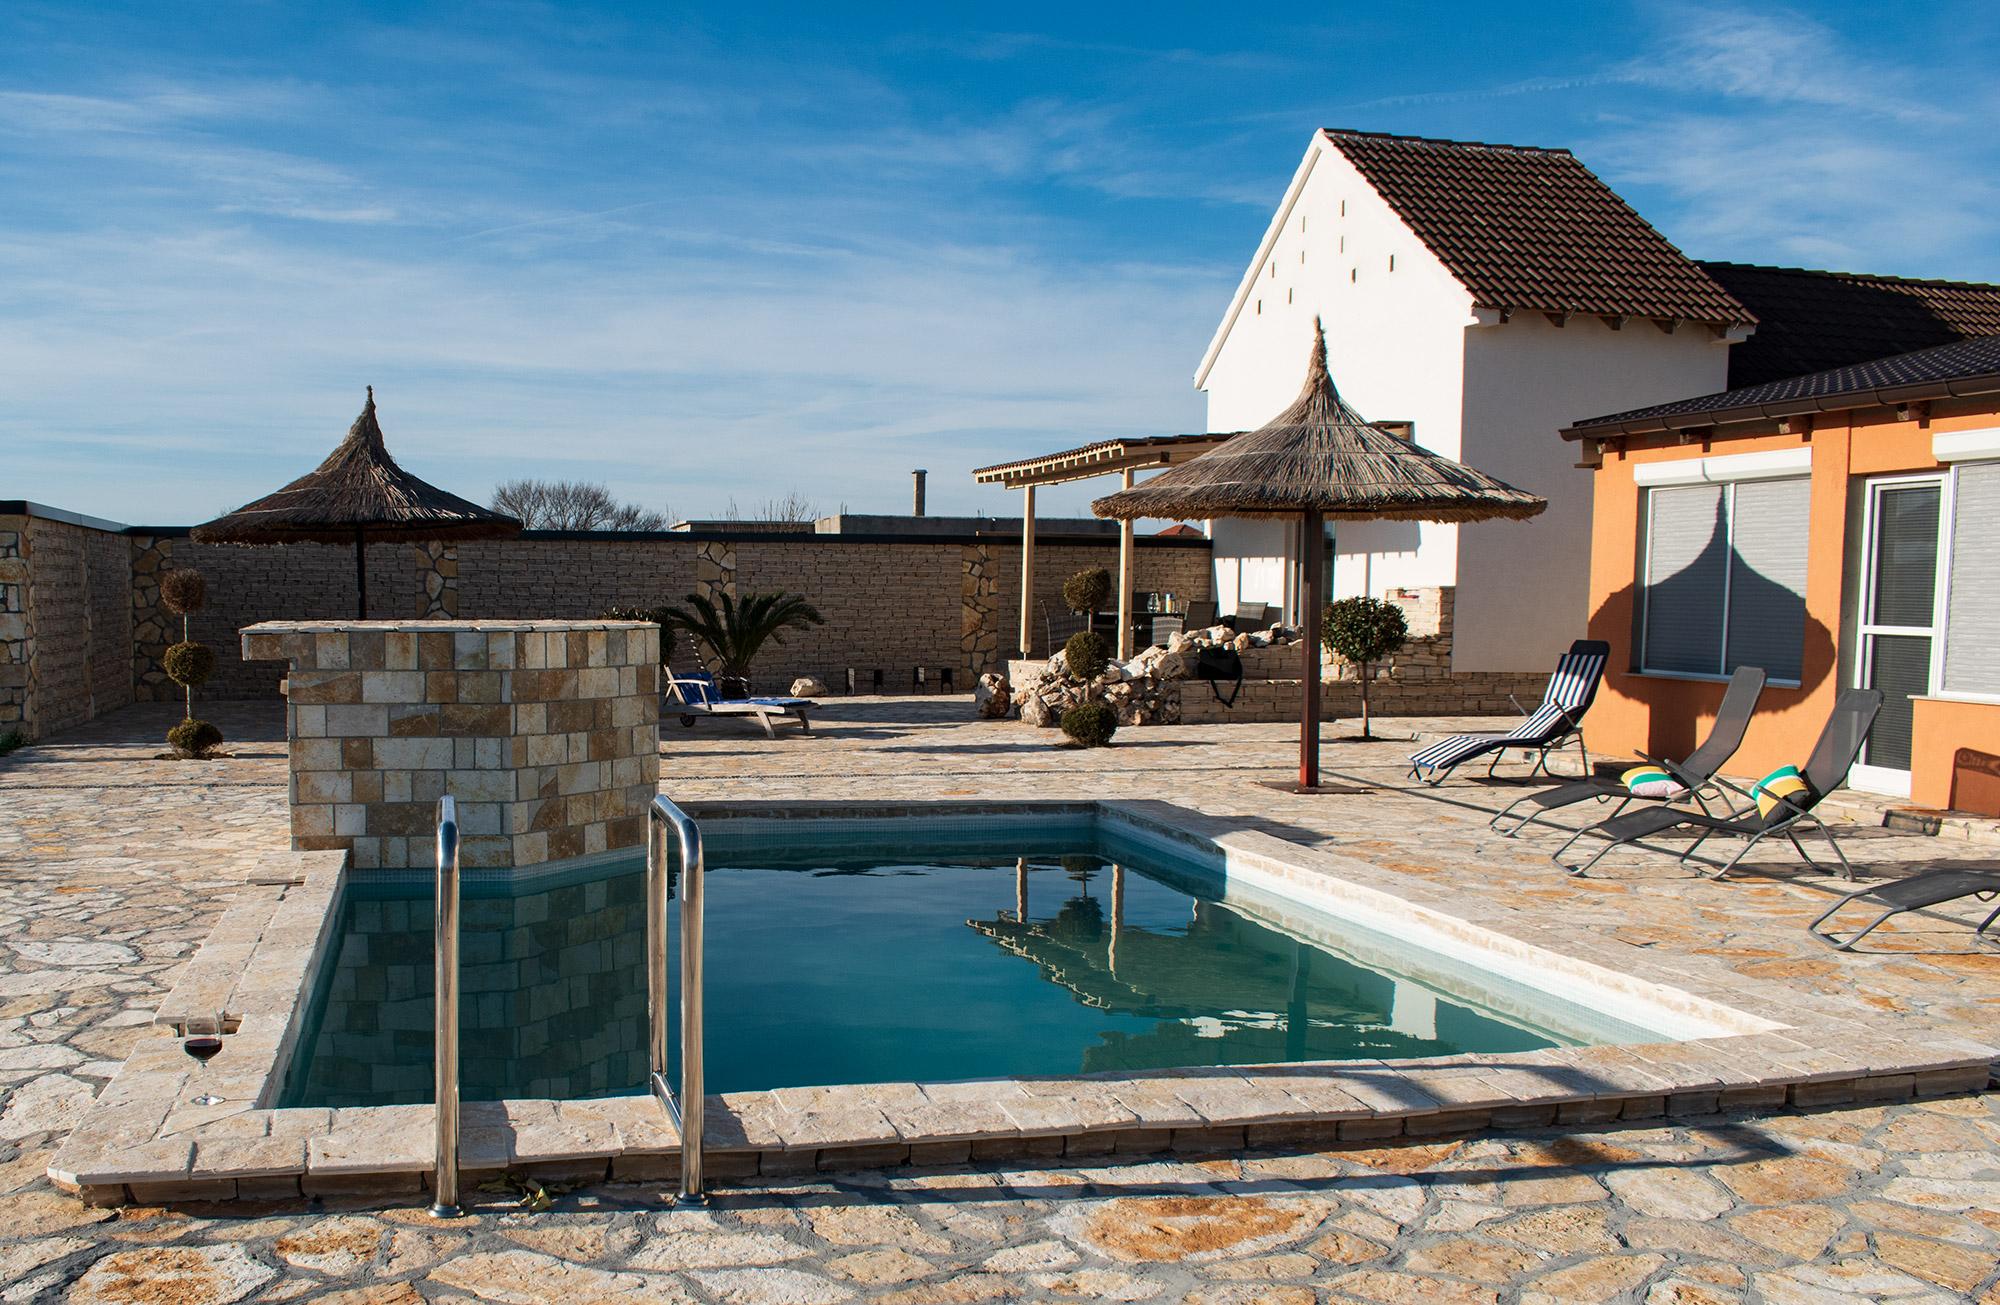 AP Villa Pristeg - Pool and back